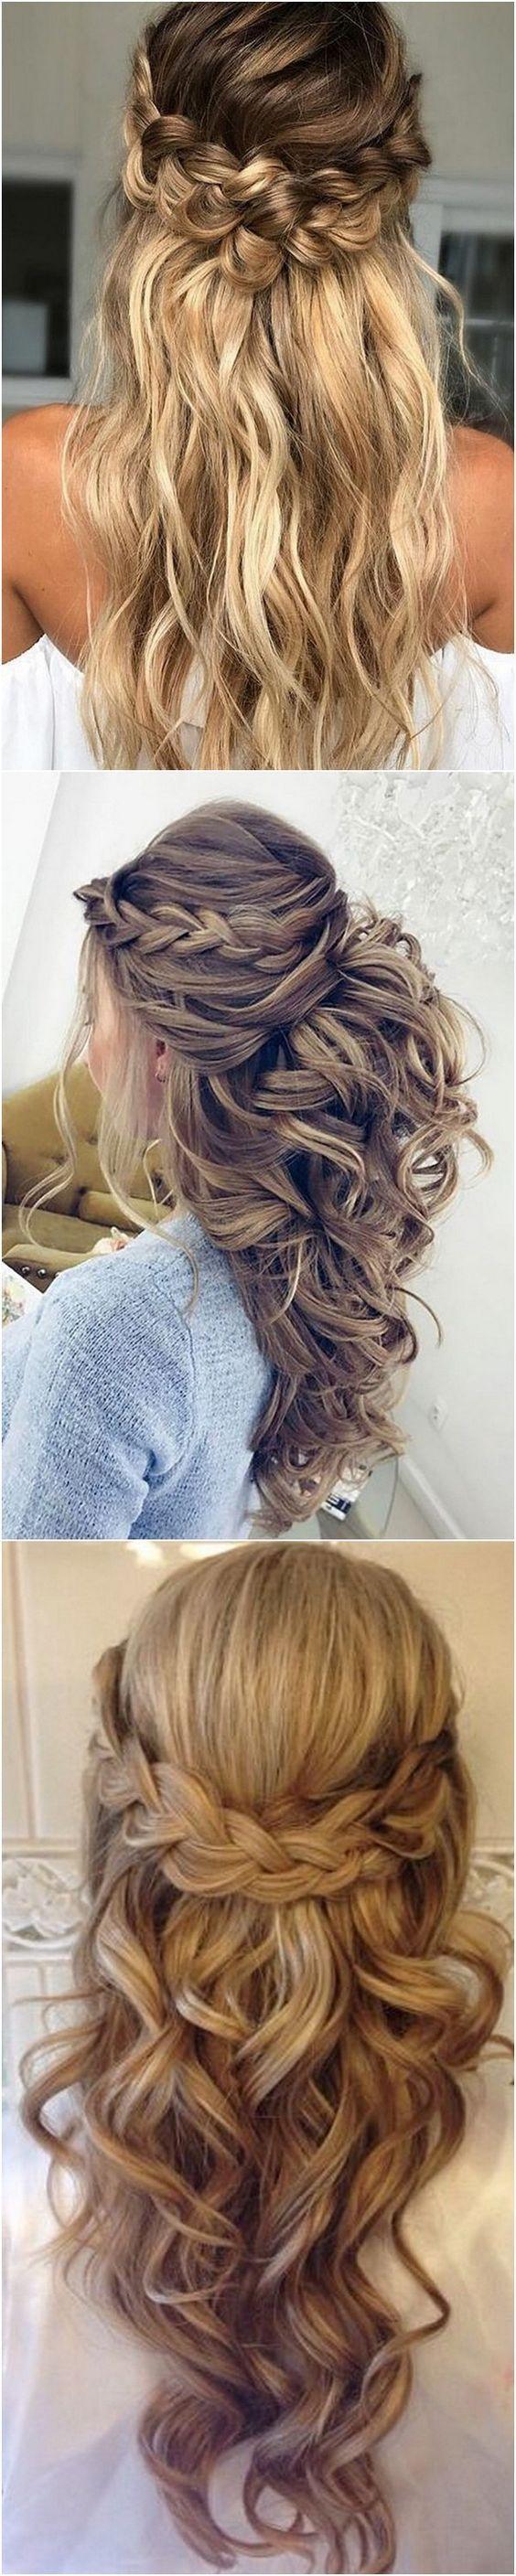 Pretty half up half down wedding hairstyle ideas weddinghairstyles